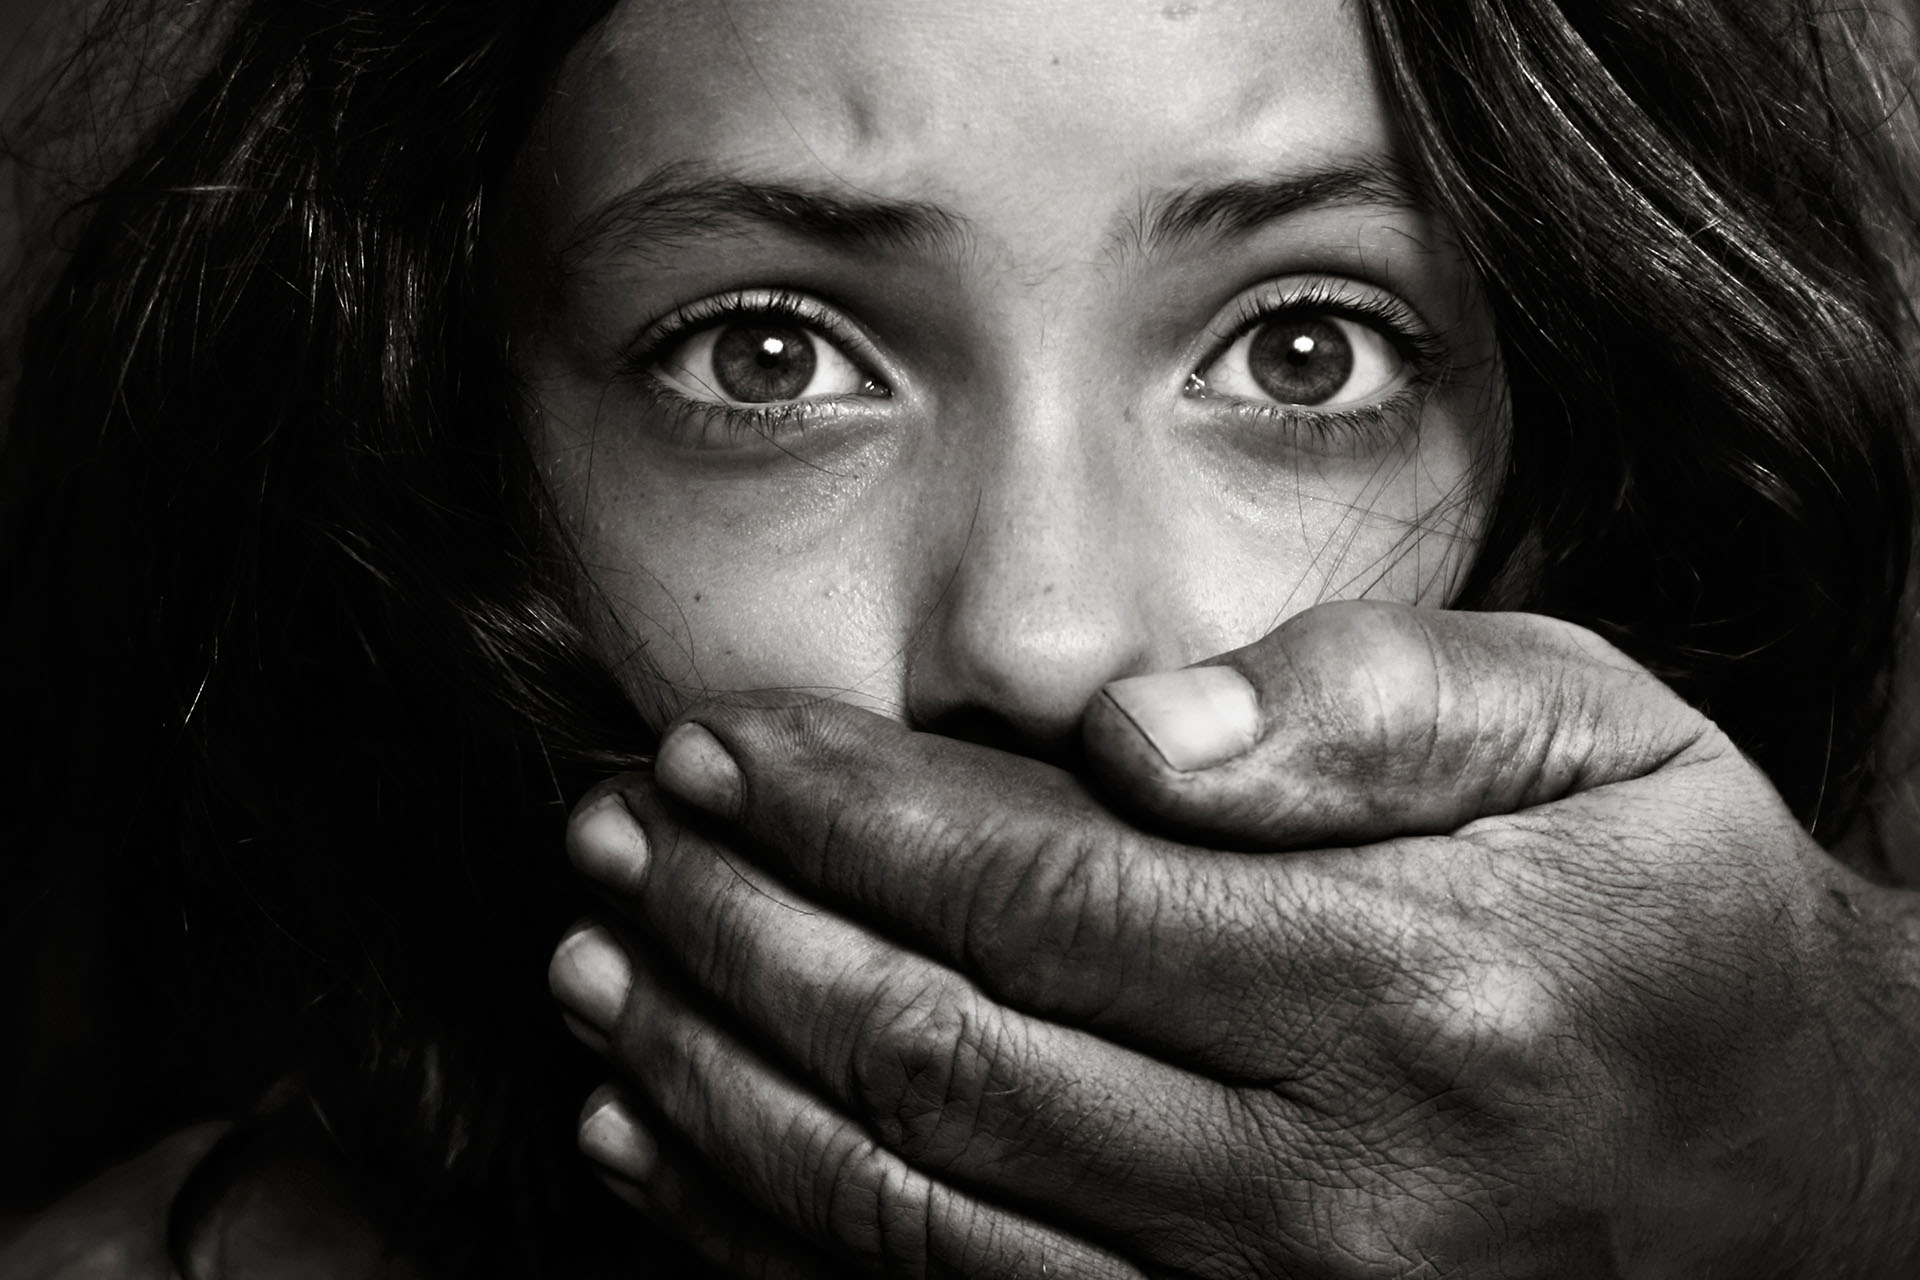 girl was raped